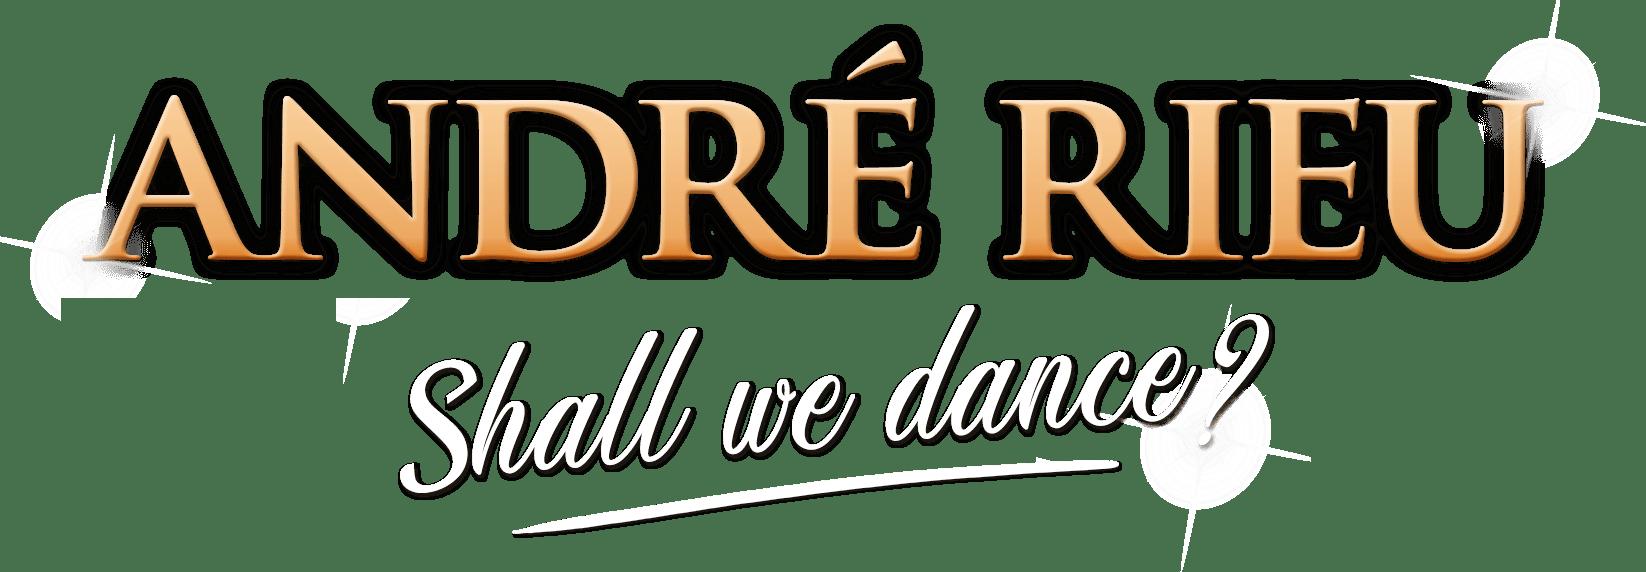 André Rieu 2019 Maastricht Concert: Verhaal | Piece of Magic